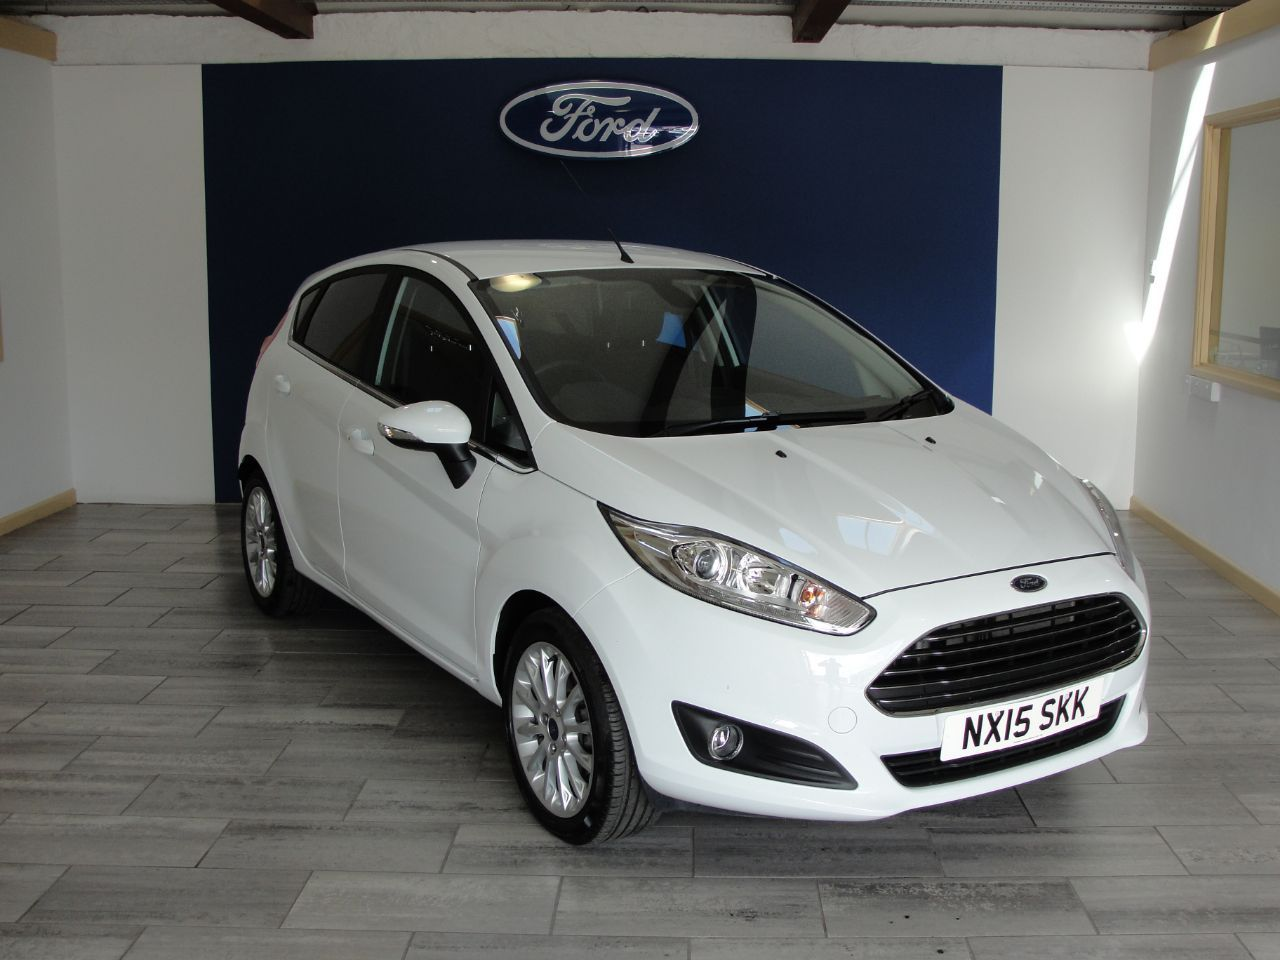 Ford Fiesta 1 0 Ecoboost 125 Titanium X 5dr Hatchback Petrol White